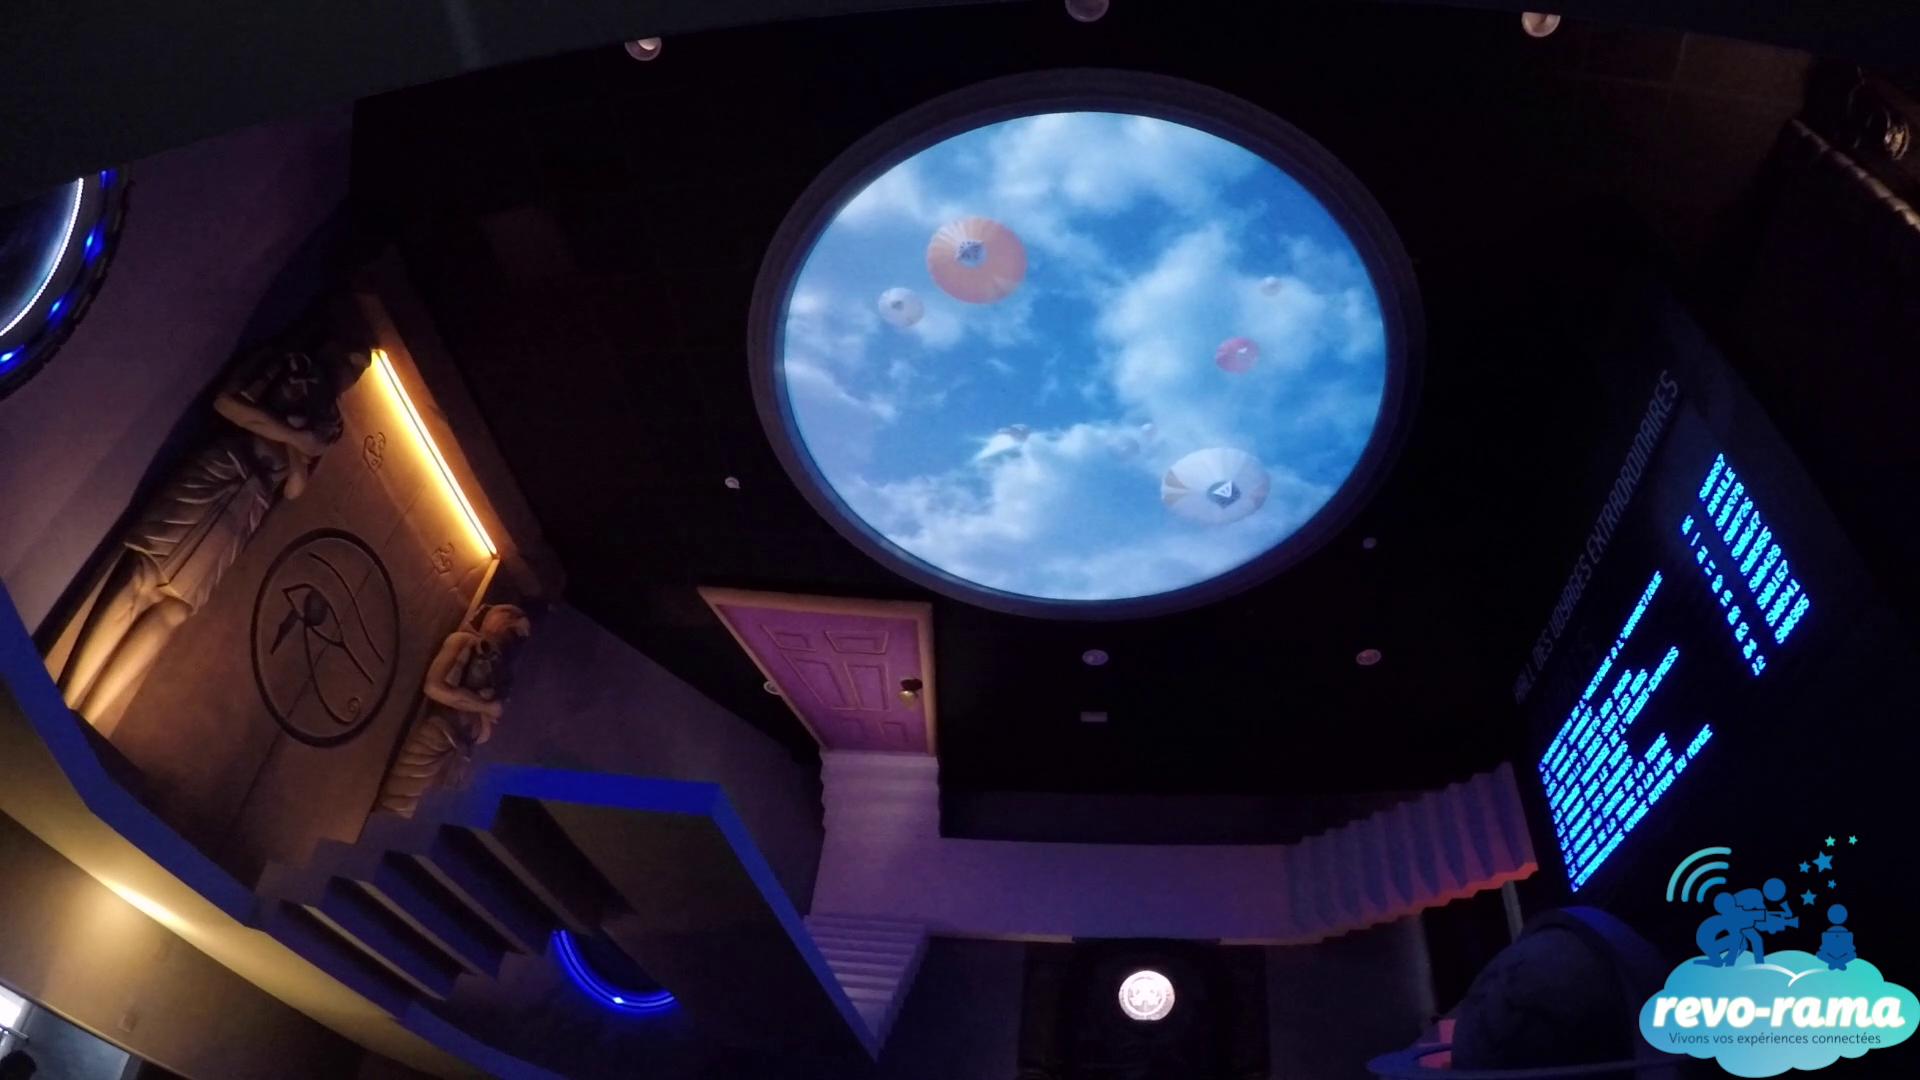 revo-rama-futuroscope-sebastien-loeb-racing-experience-vr5d-htc-vive-2018